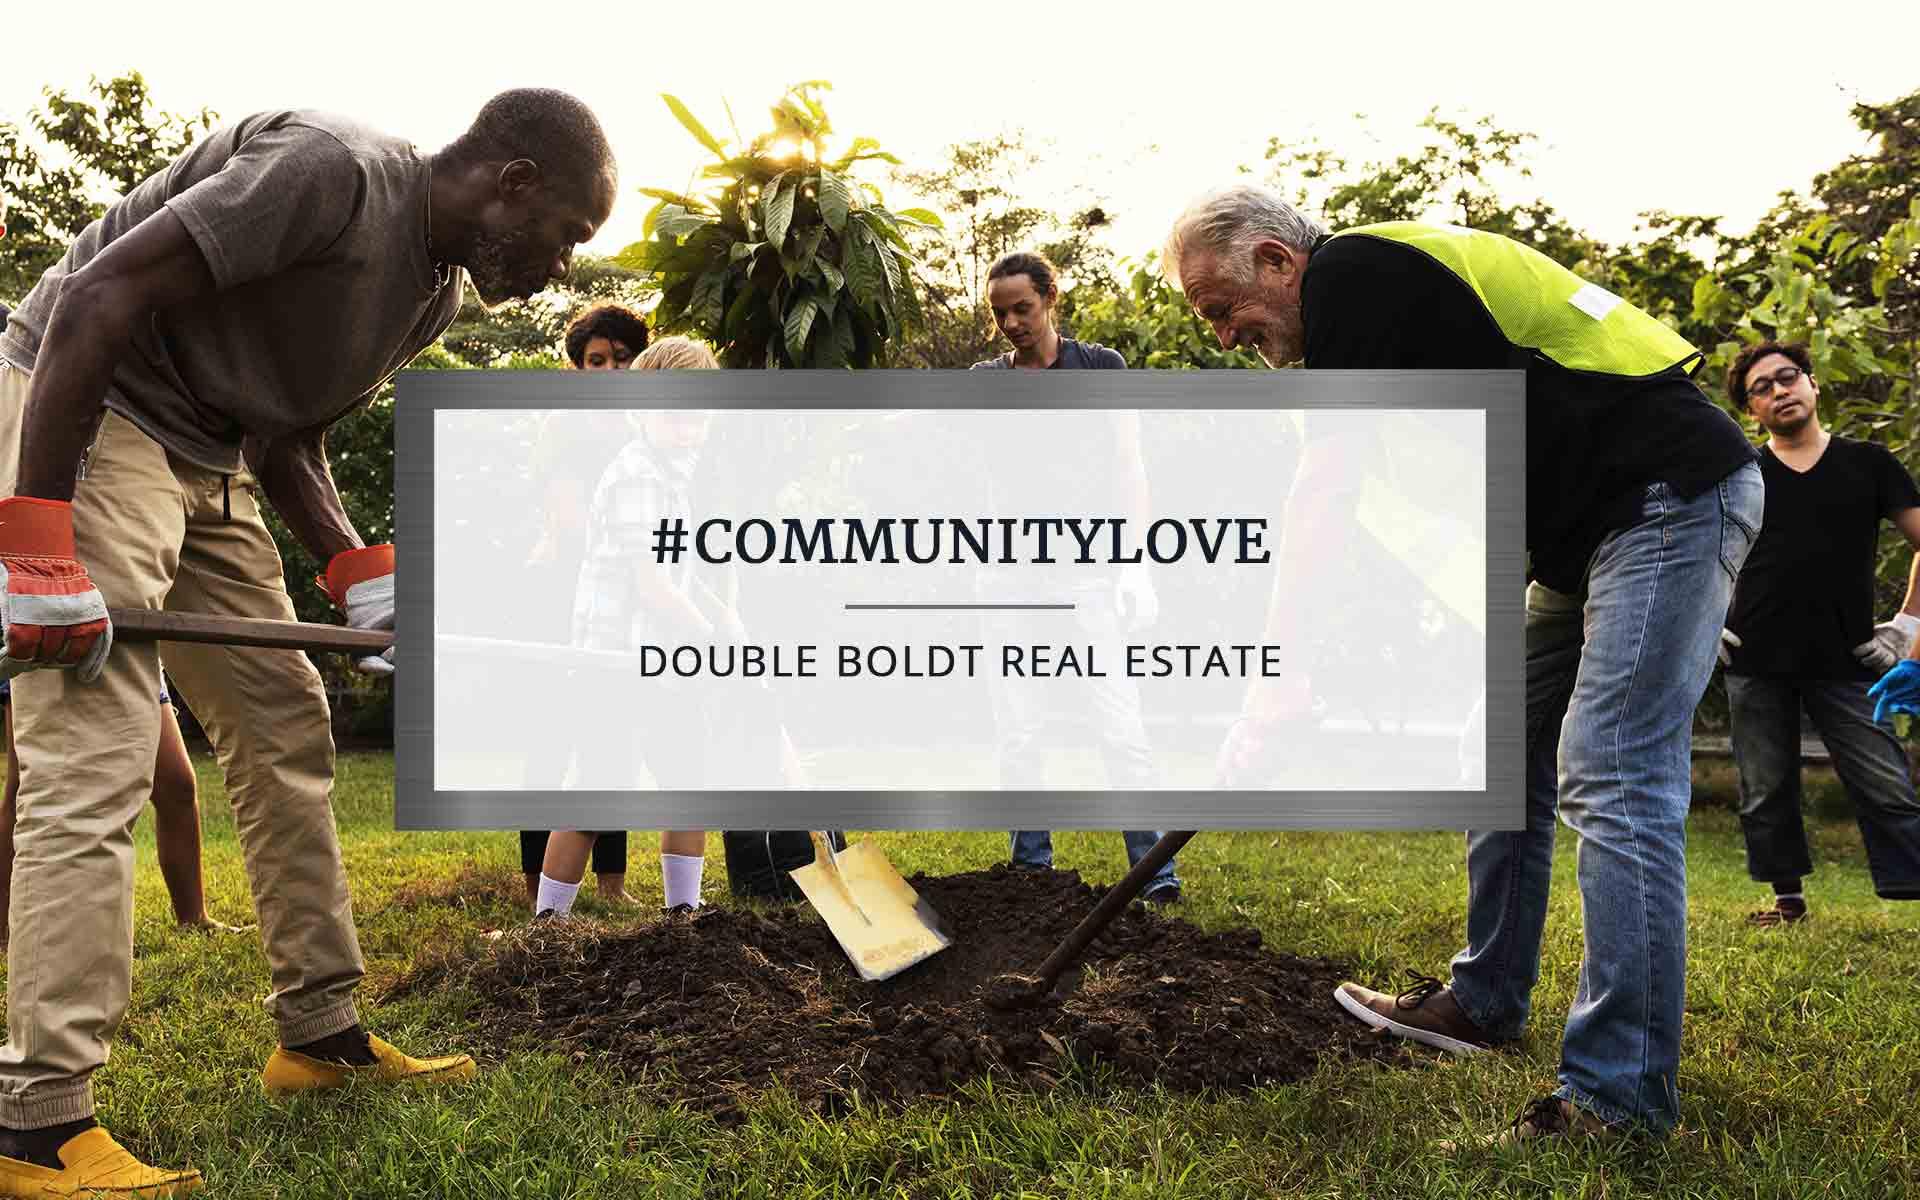 #CommunityLove | Double Boldt Real Estate